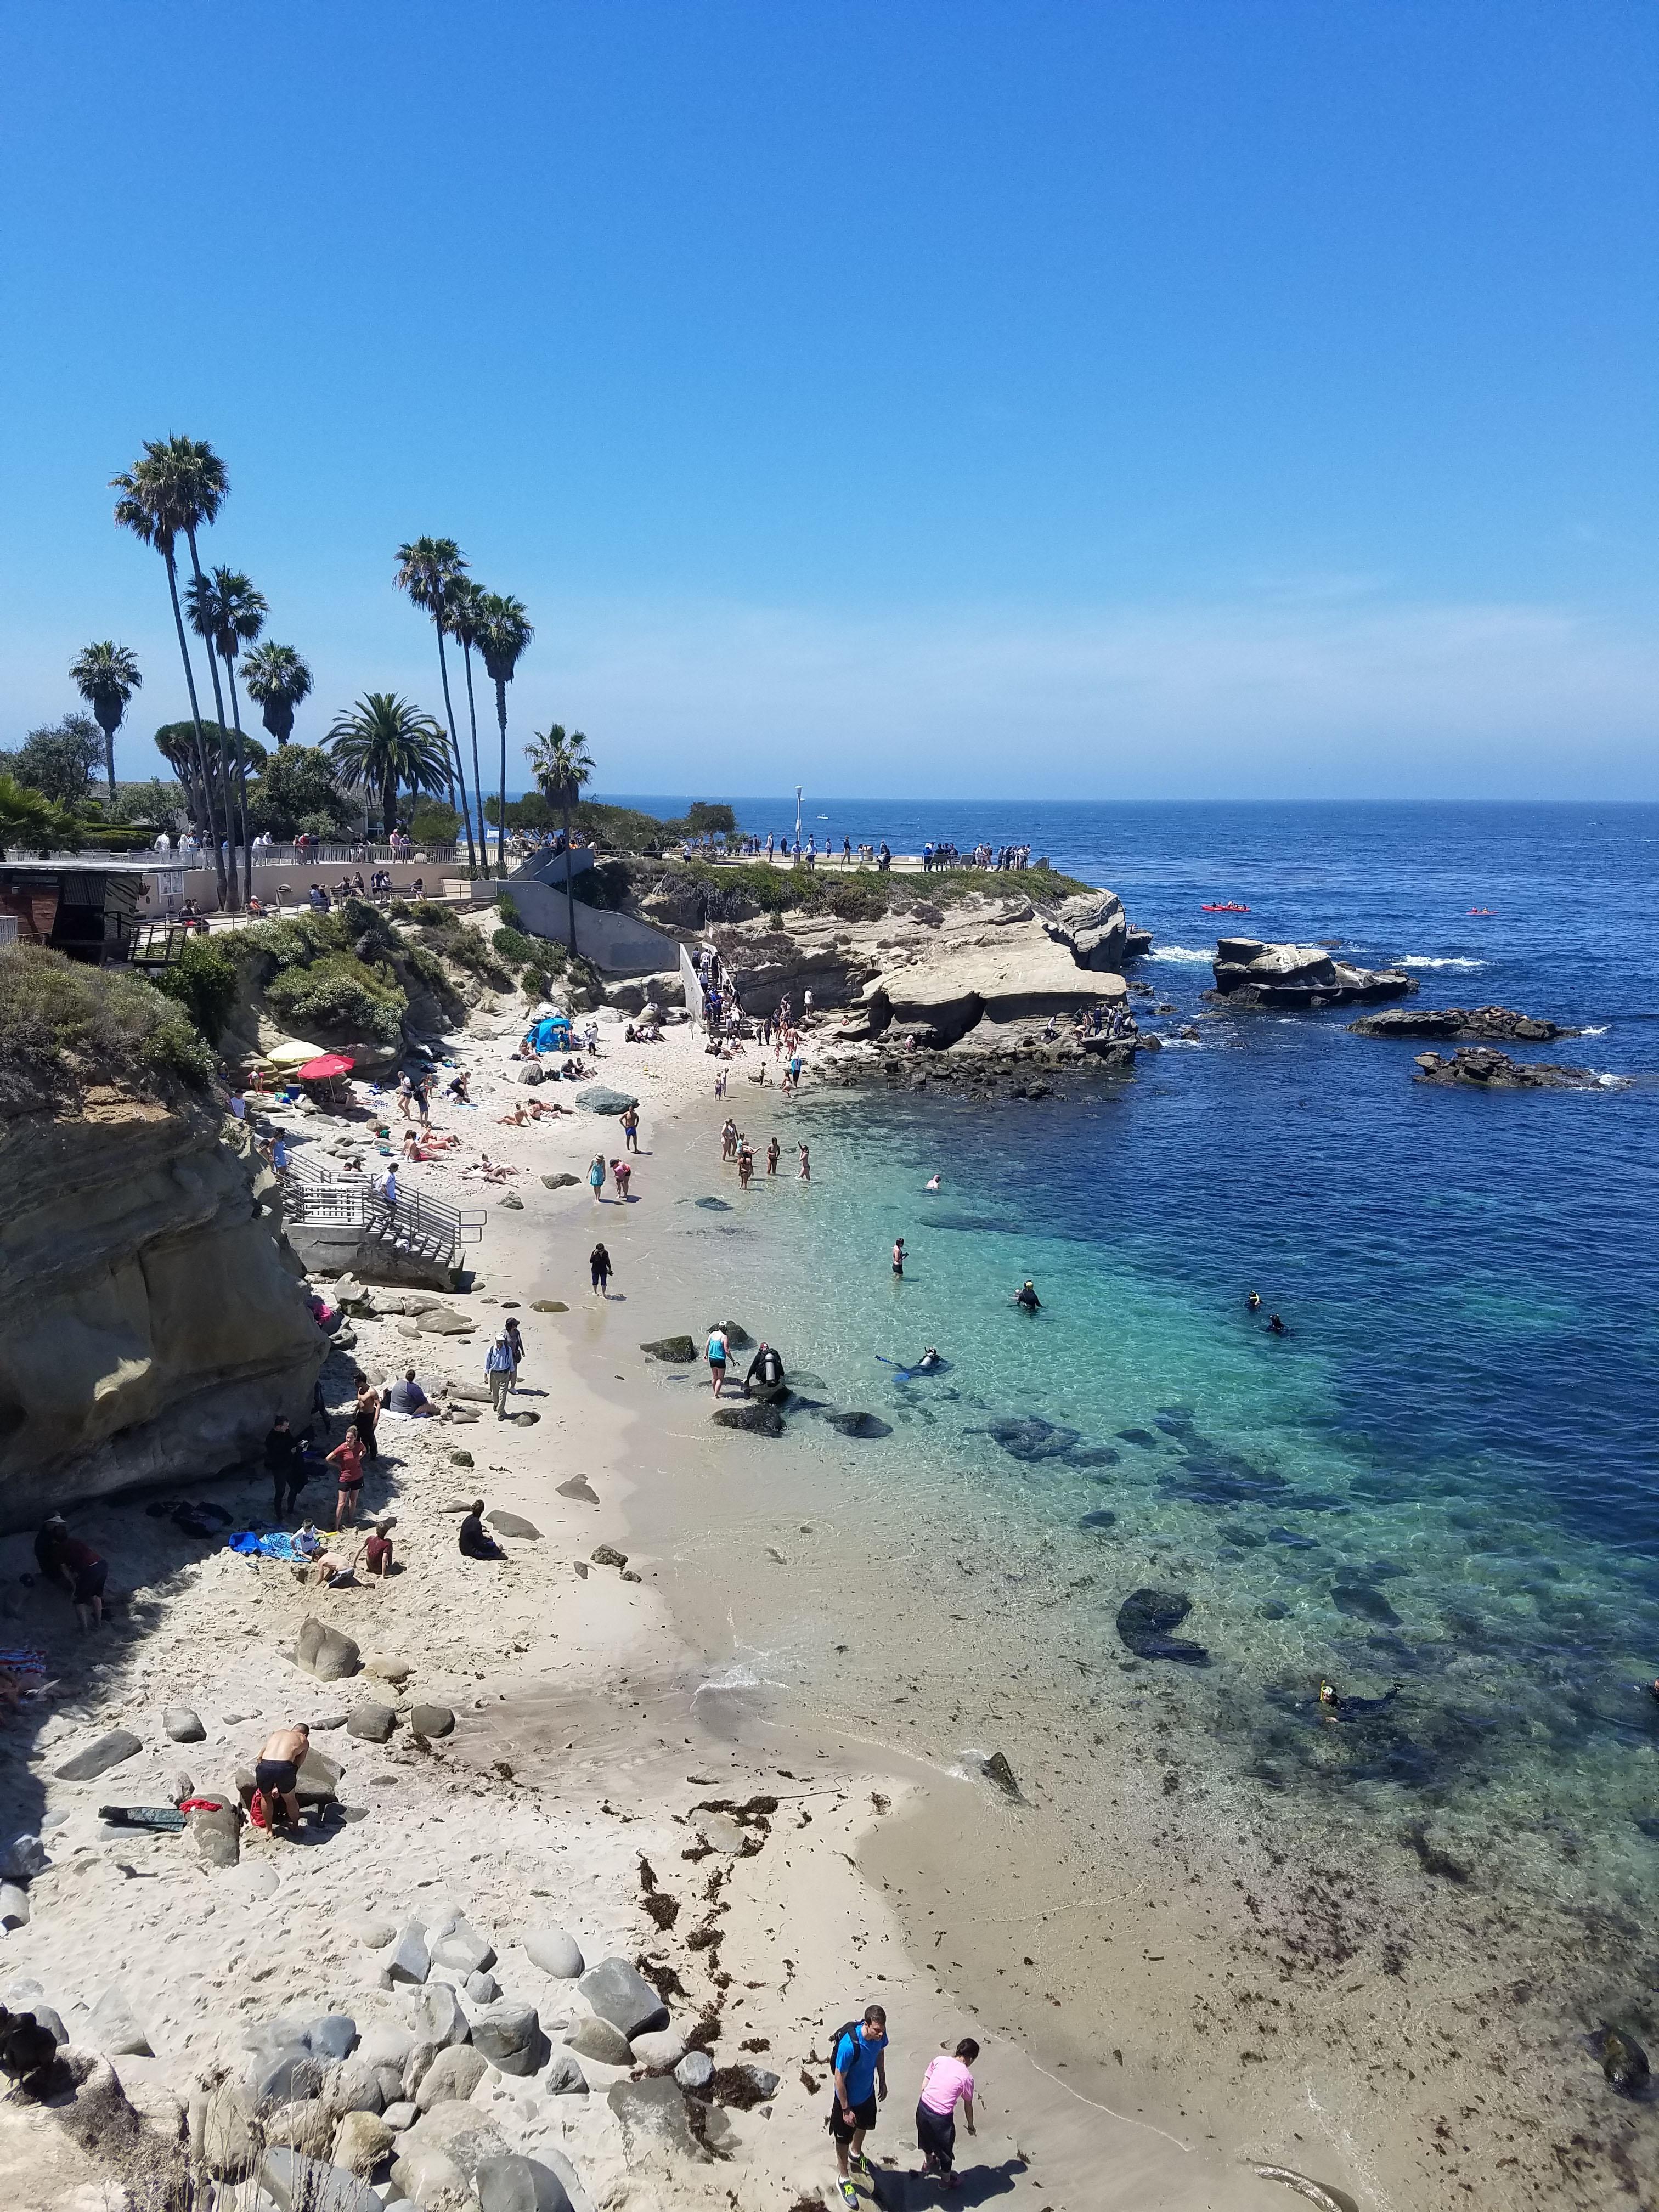 San Diego Beaches: La Jolla Cove